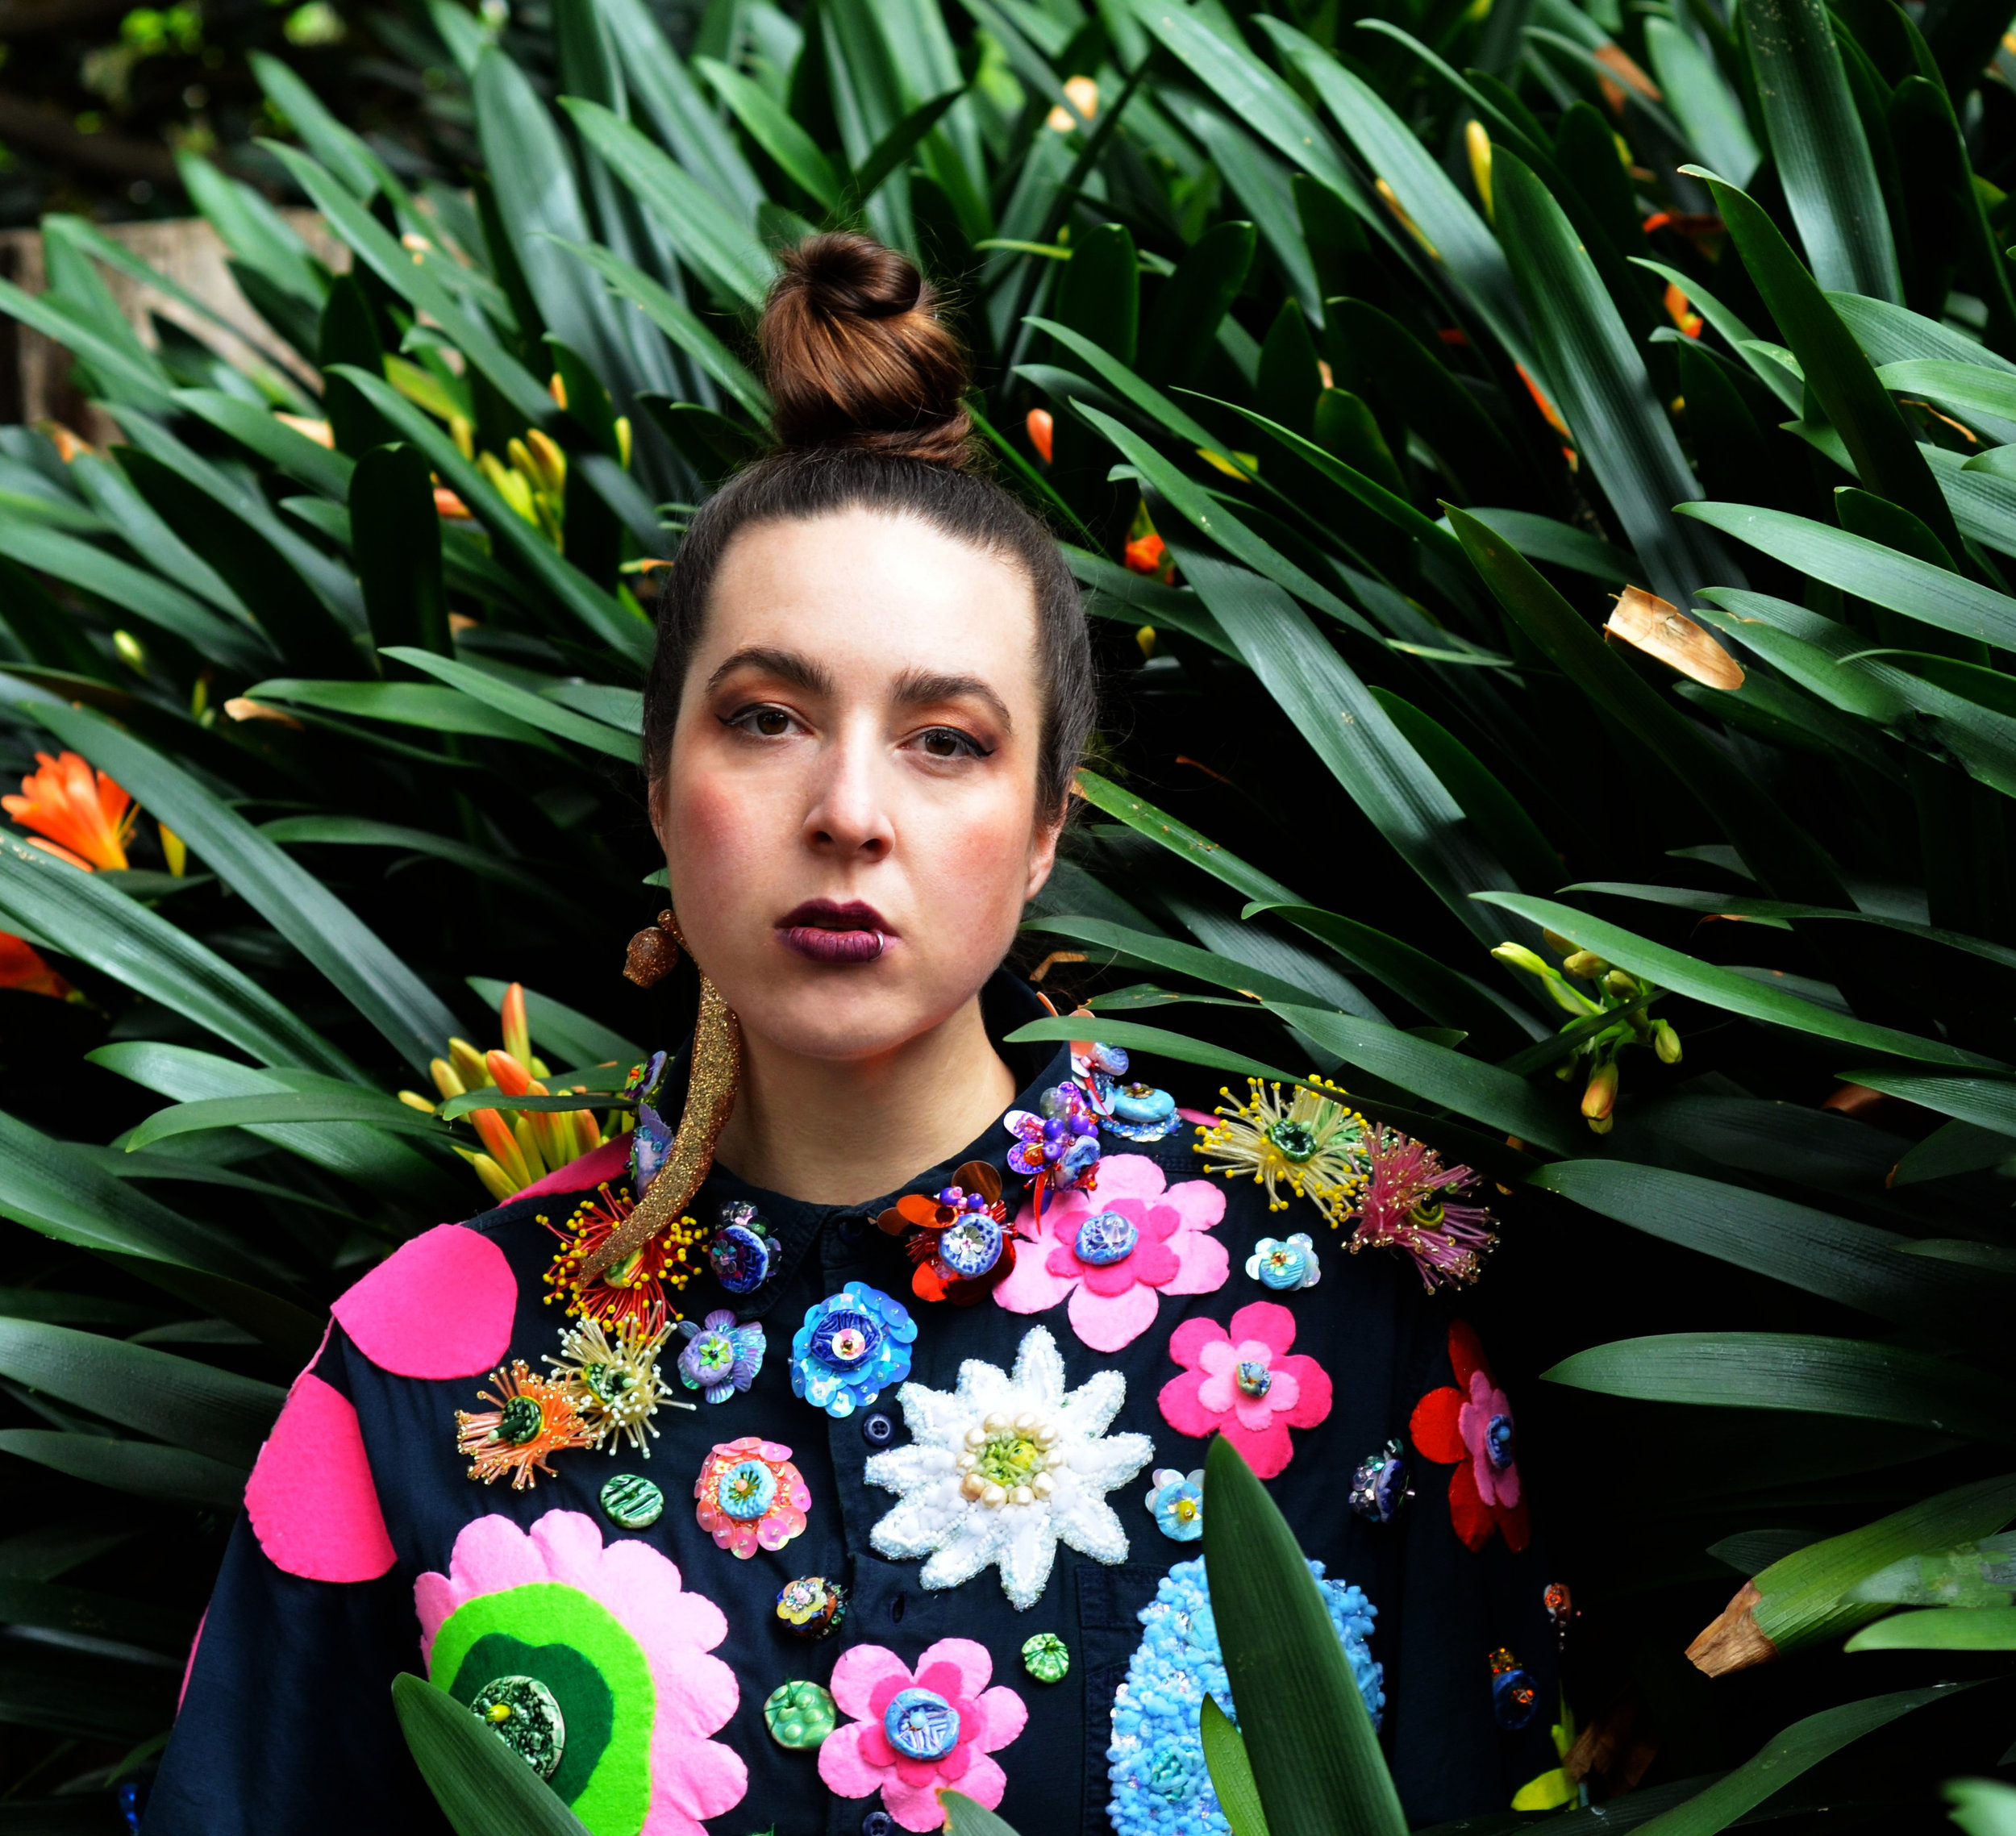 Louise Meuwissen x Glenn Barkley, Blossom shirt, 2018, photograph by Isabelle Gander.jpg